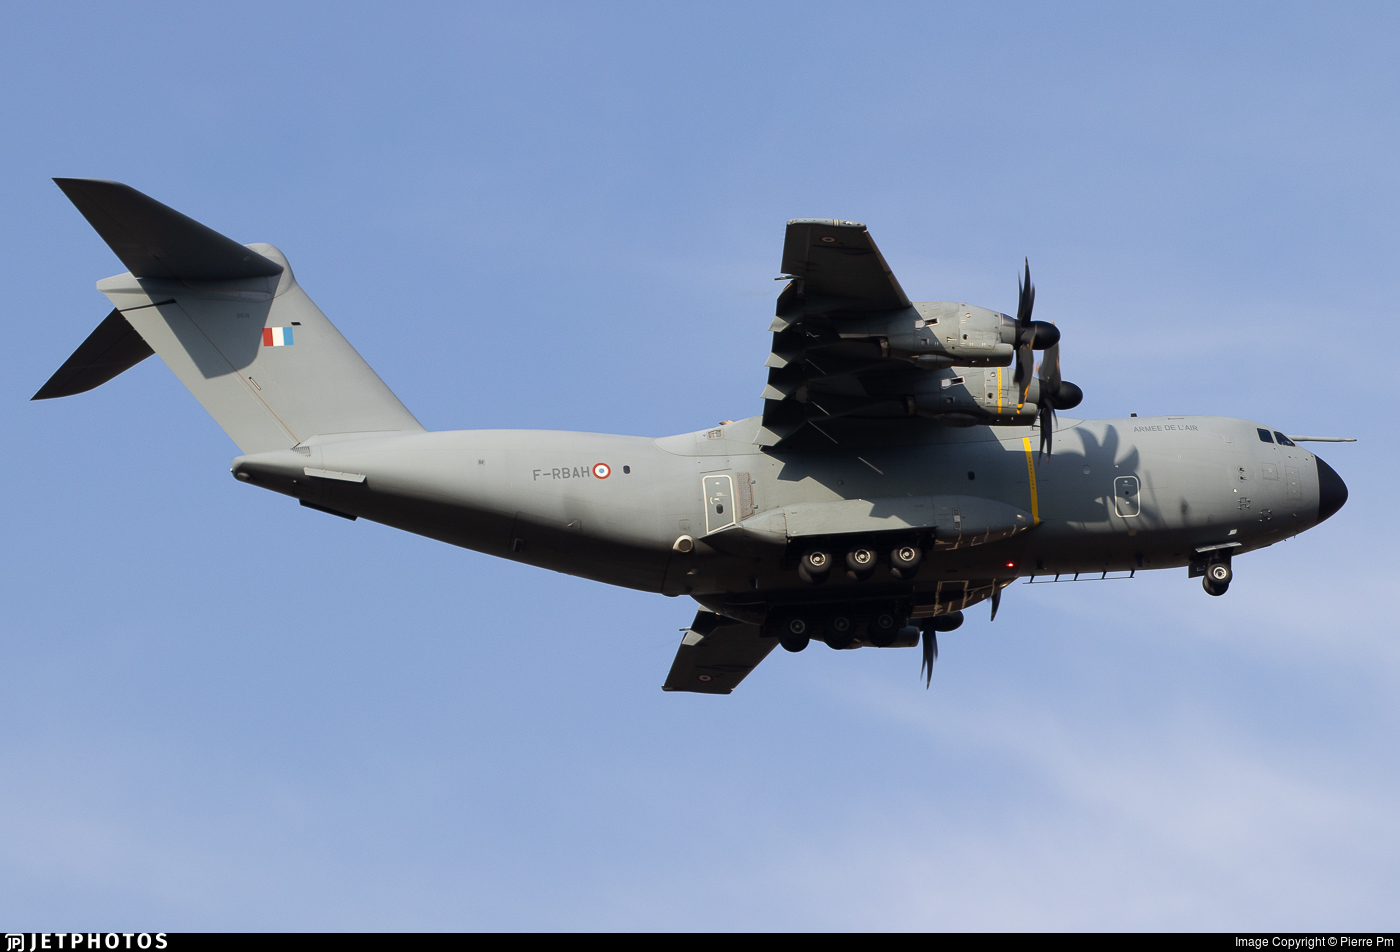 0031 - Airbus A400M - France - Air Force